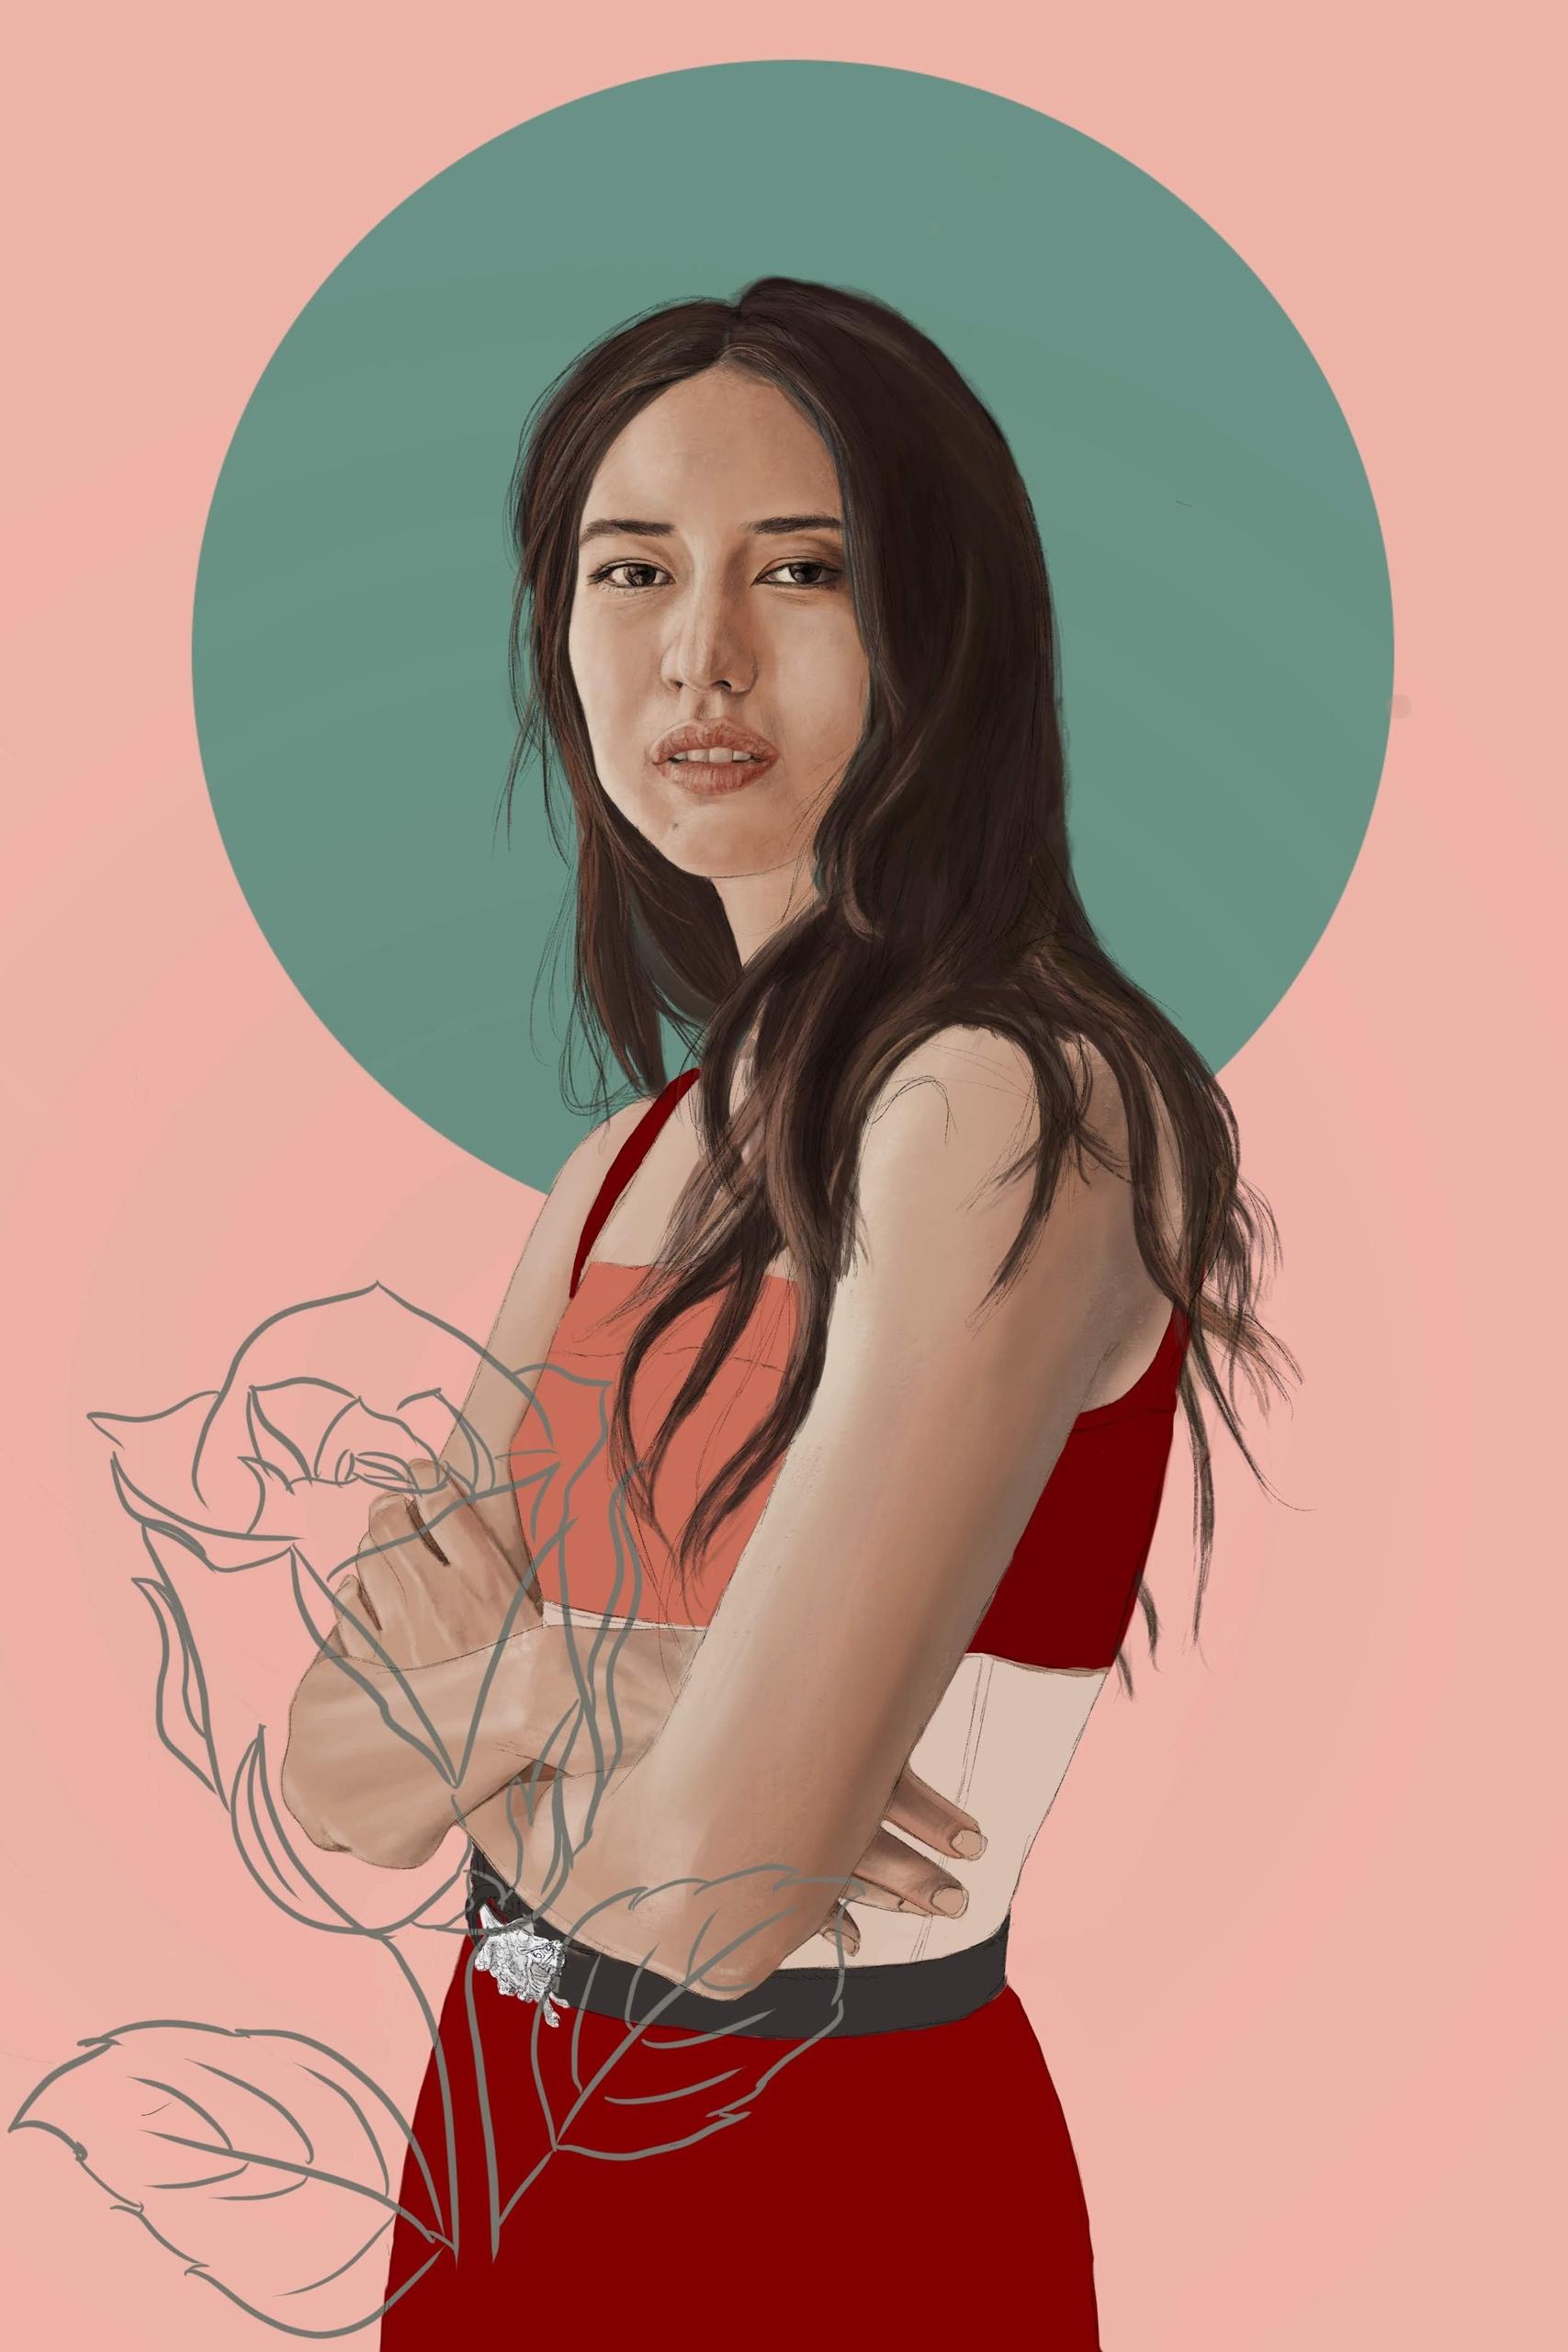 Sonoya Mizuno - digital paintin - psthatsme | ello